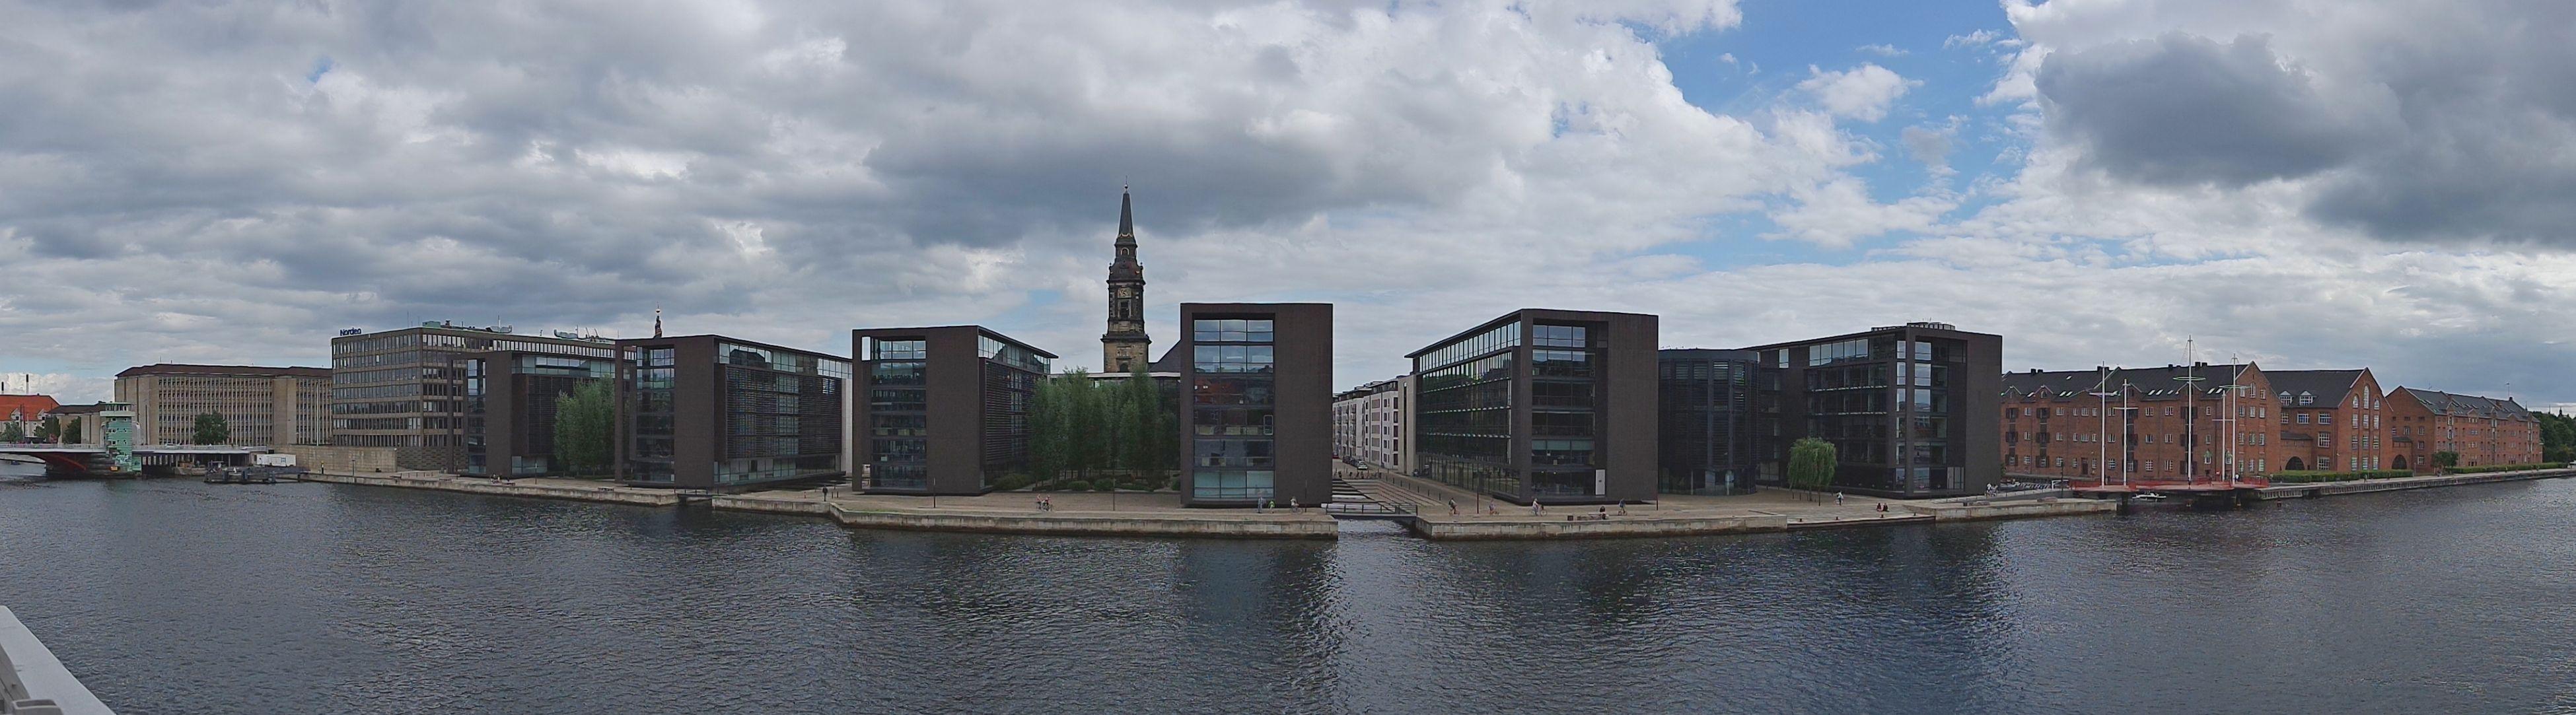 Панорама Копенгагена с обзорной площадки